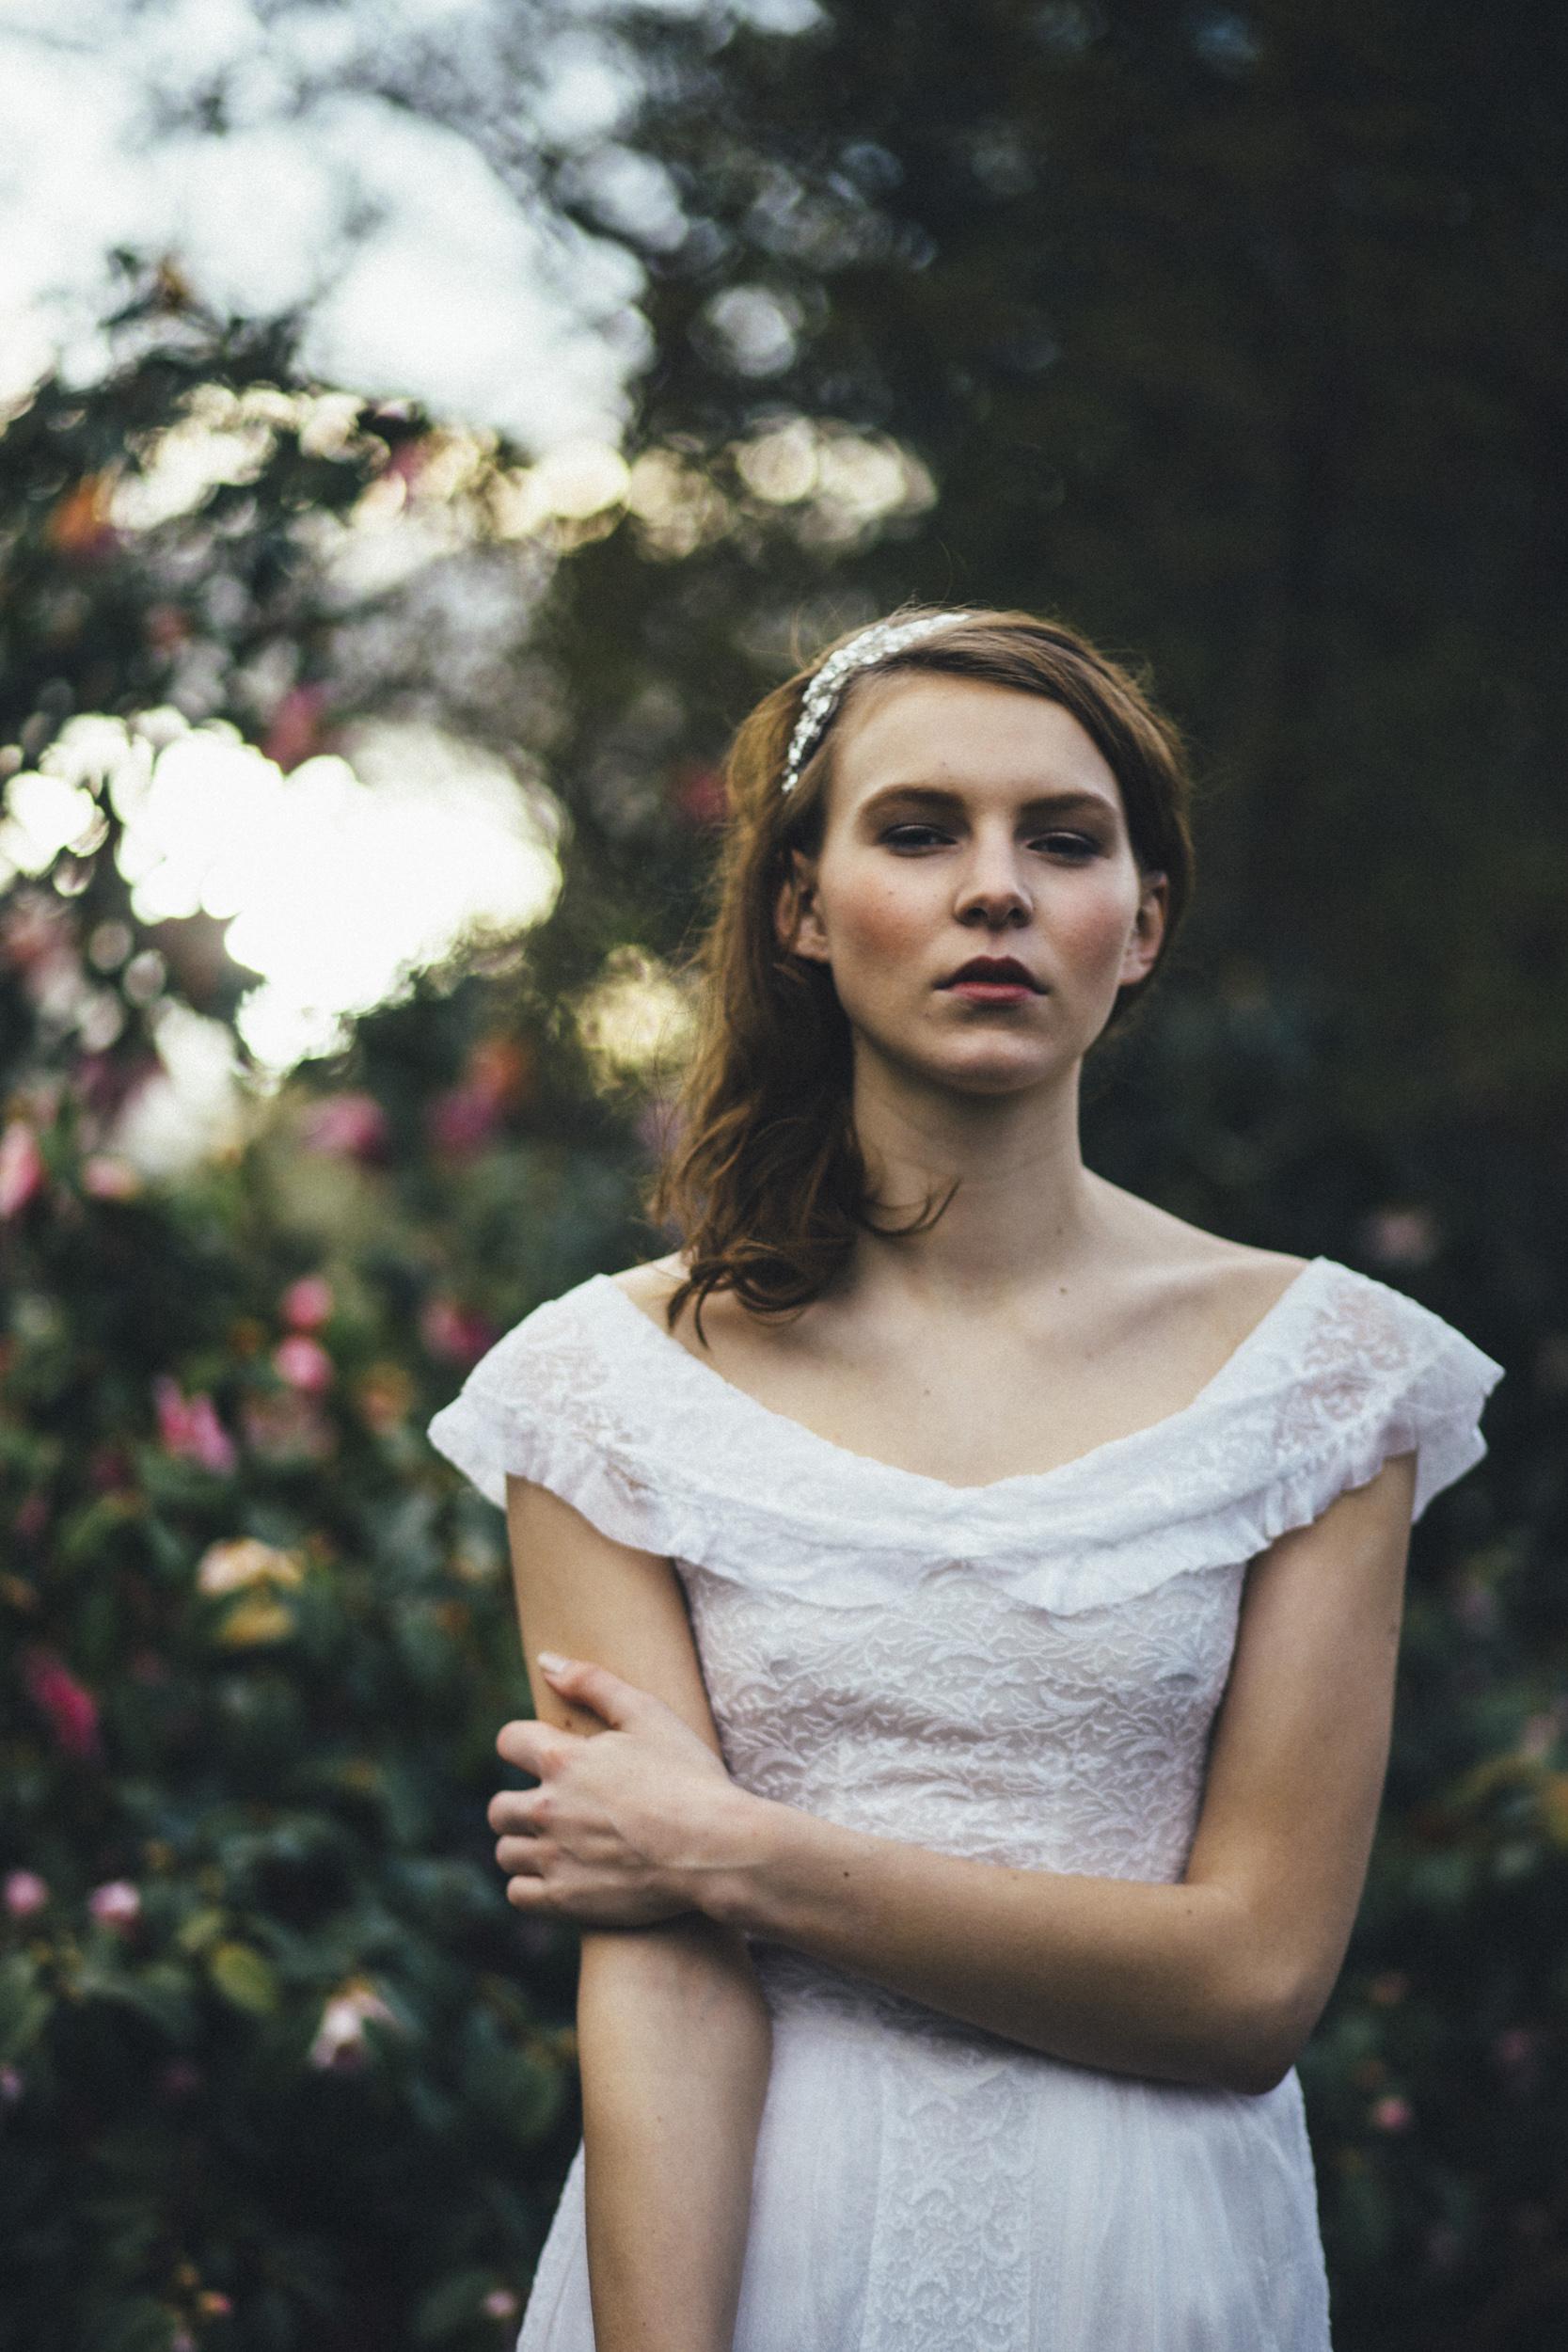 Spring-Bridal-Kate-Beaumont-Shelley-Richmond-Vintage-Wedding-Dress-13.jpg